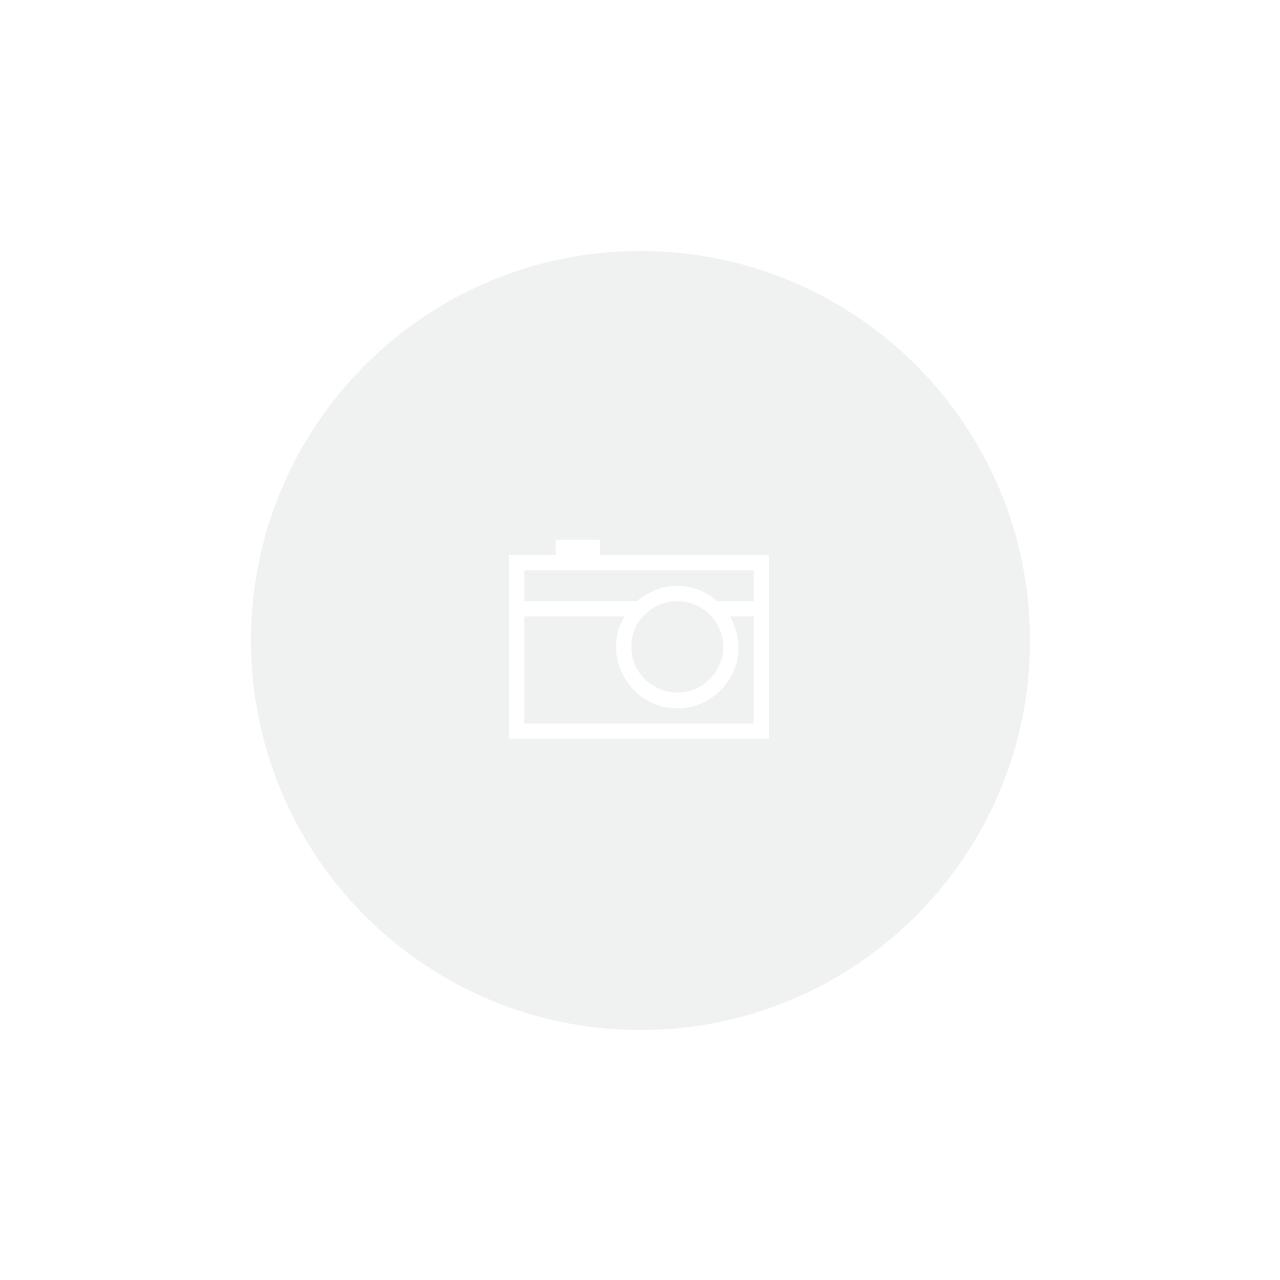 Placa de Vídeo Asus Gtx 1060 6gb Ddr5 Oc Edition Dual-Gtx1060-O6g